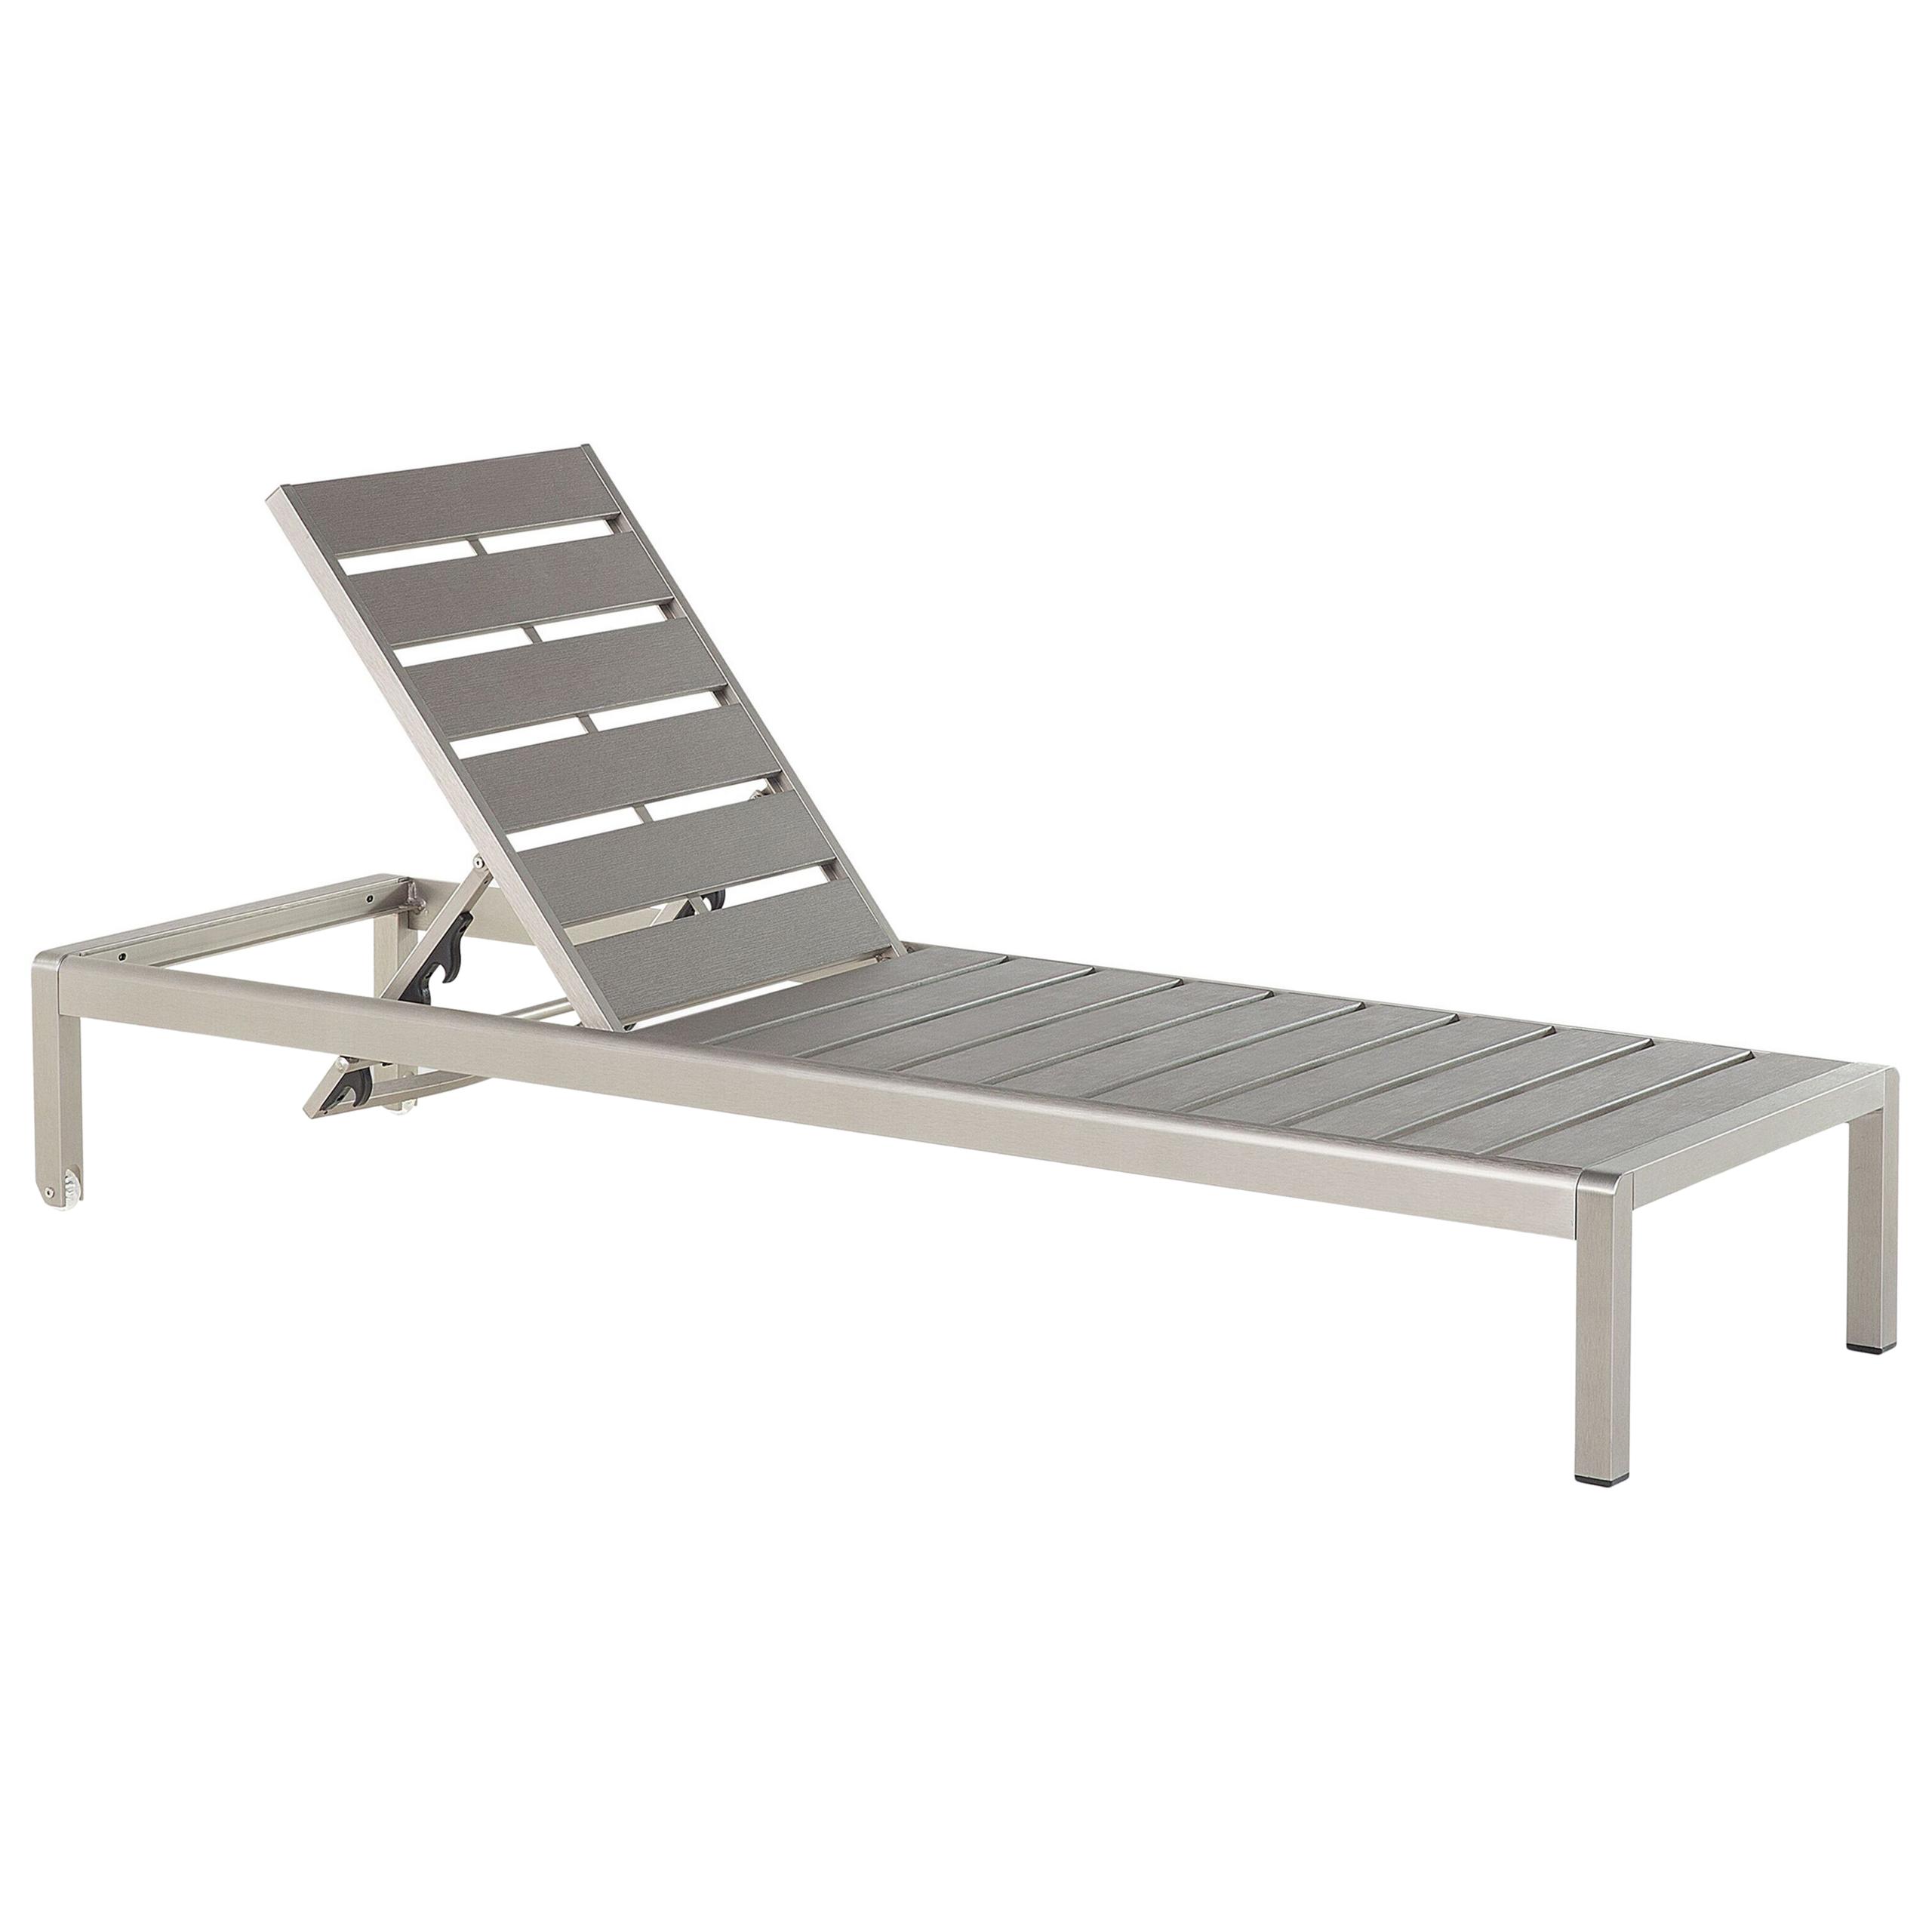 Beliani Garden Outdoor Lounger Grey and Silver Manufactured Wood Aluminium Frame Adjustable Reclining Backrest